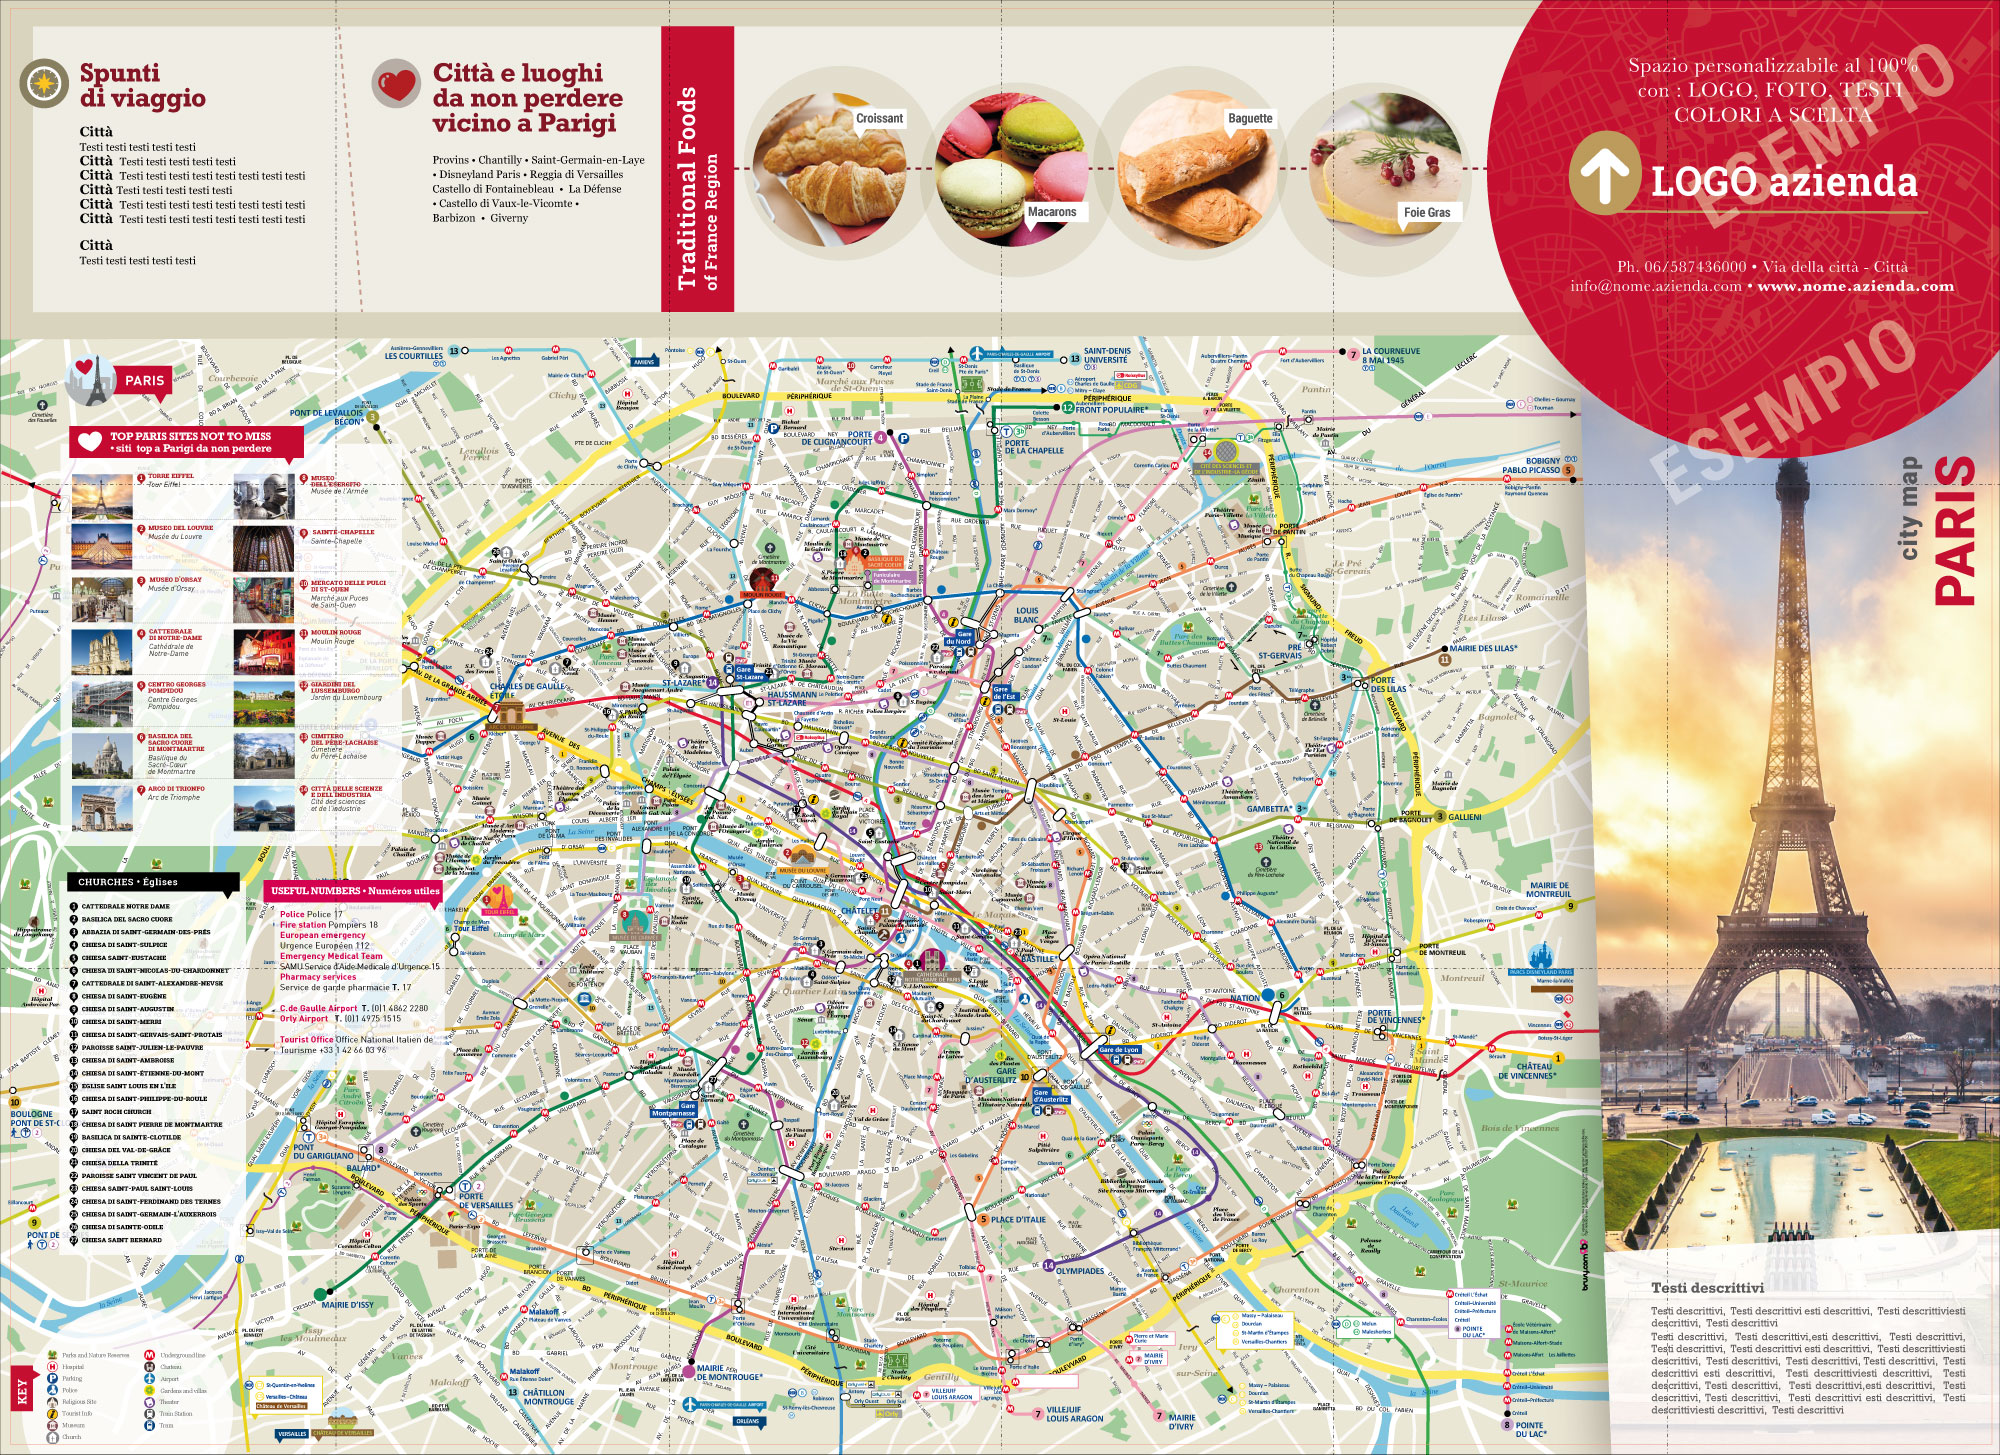 mappa di parigi cartina di parigi personalizzata